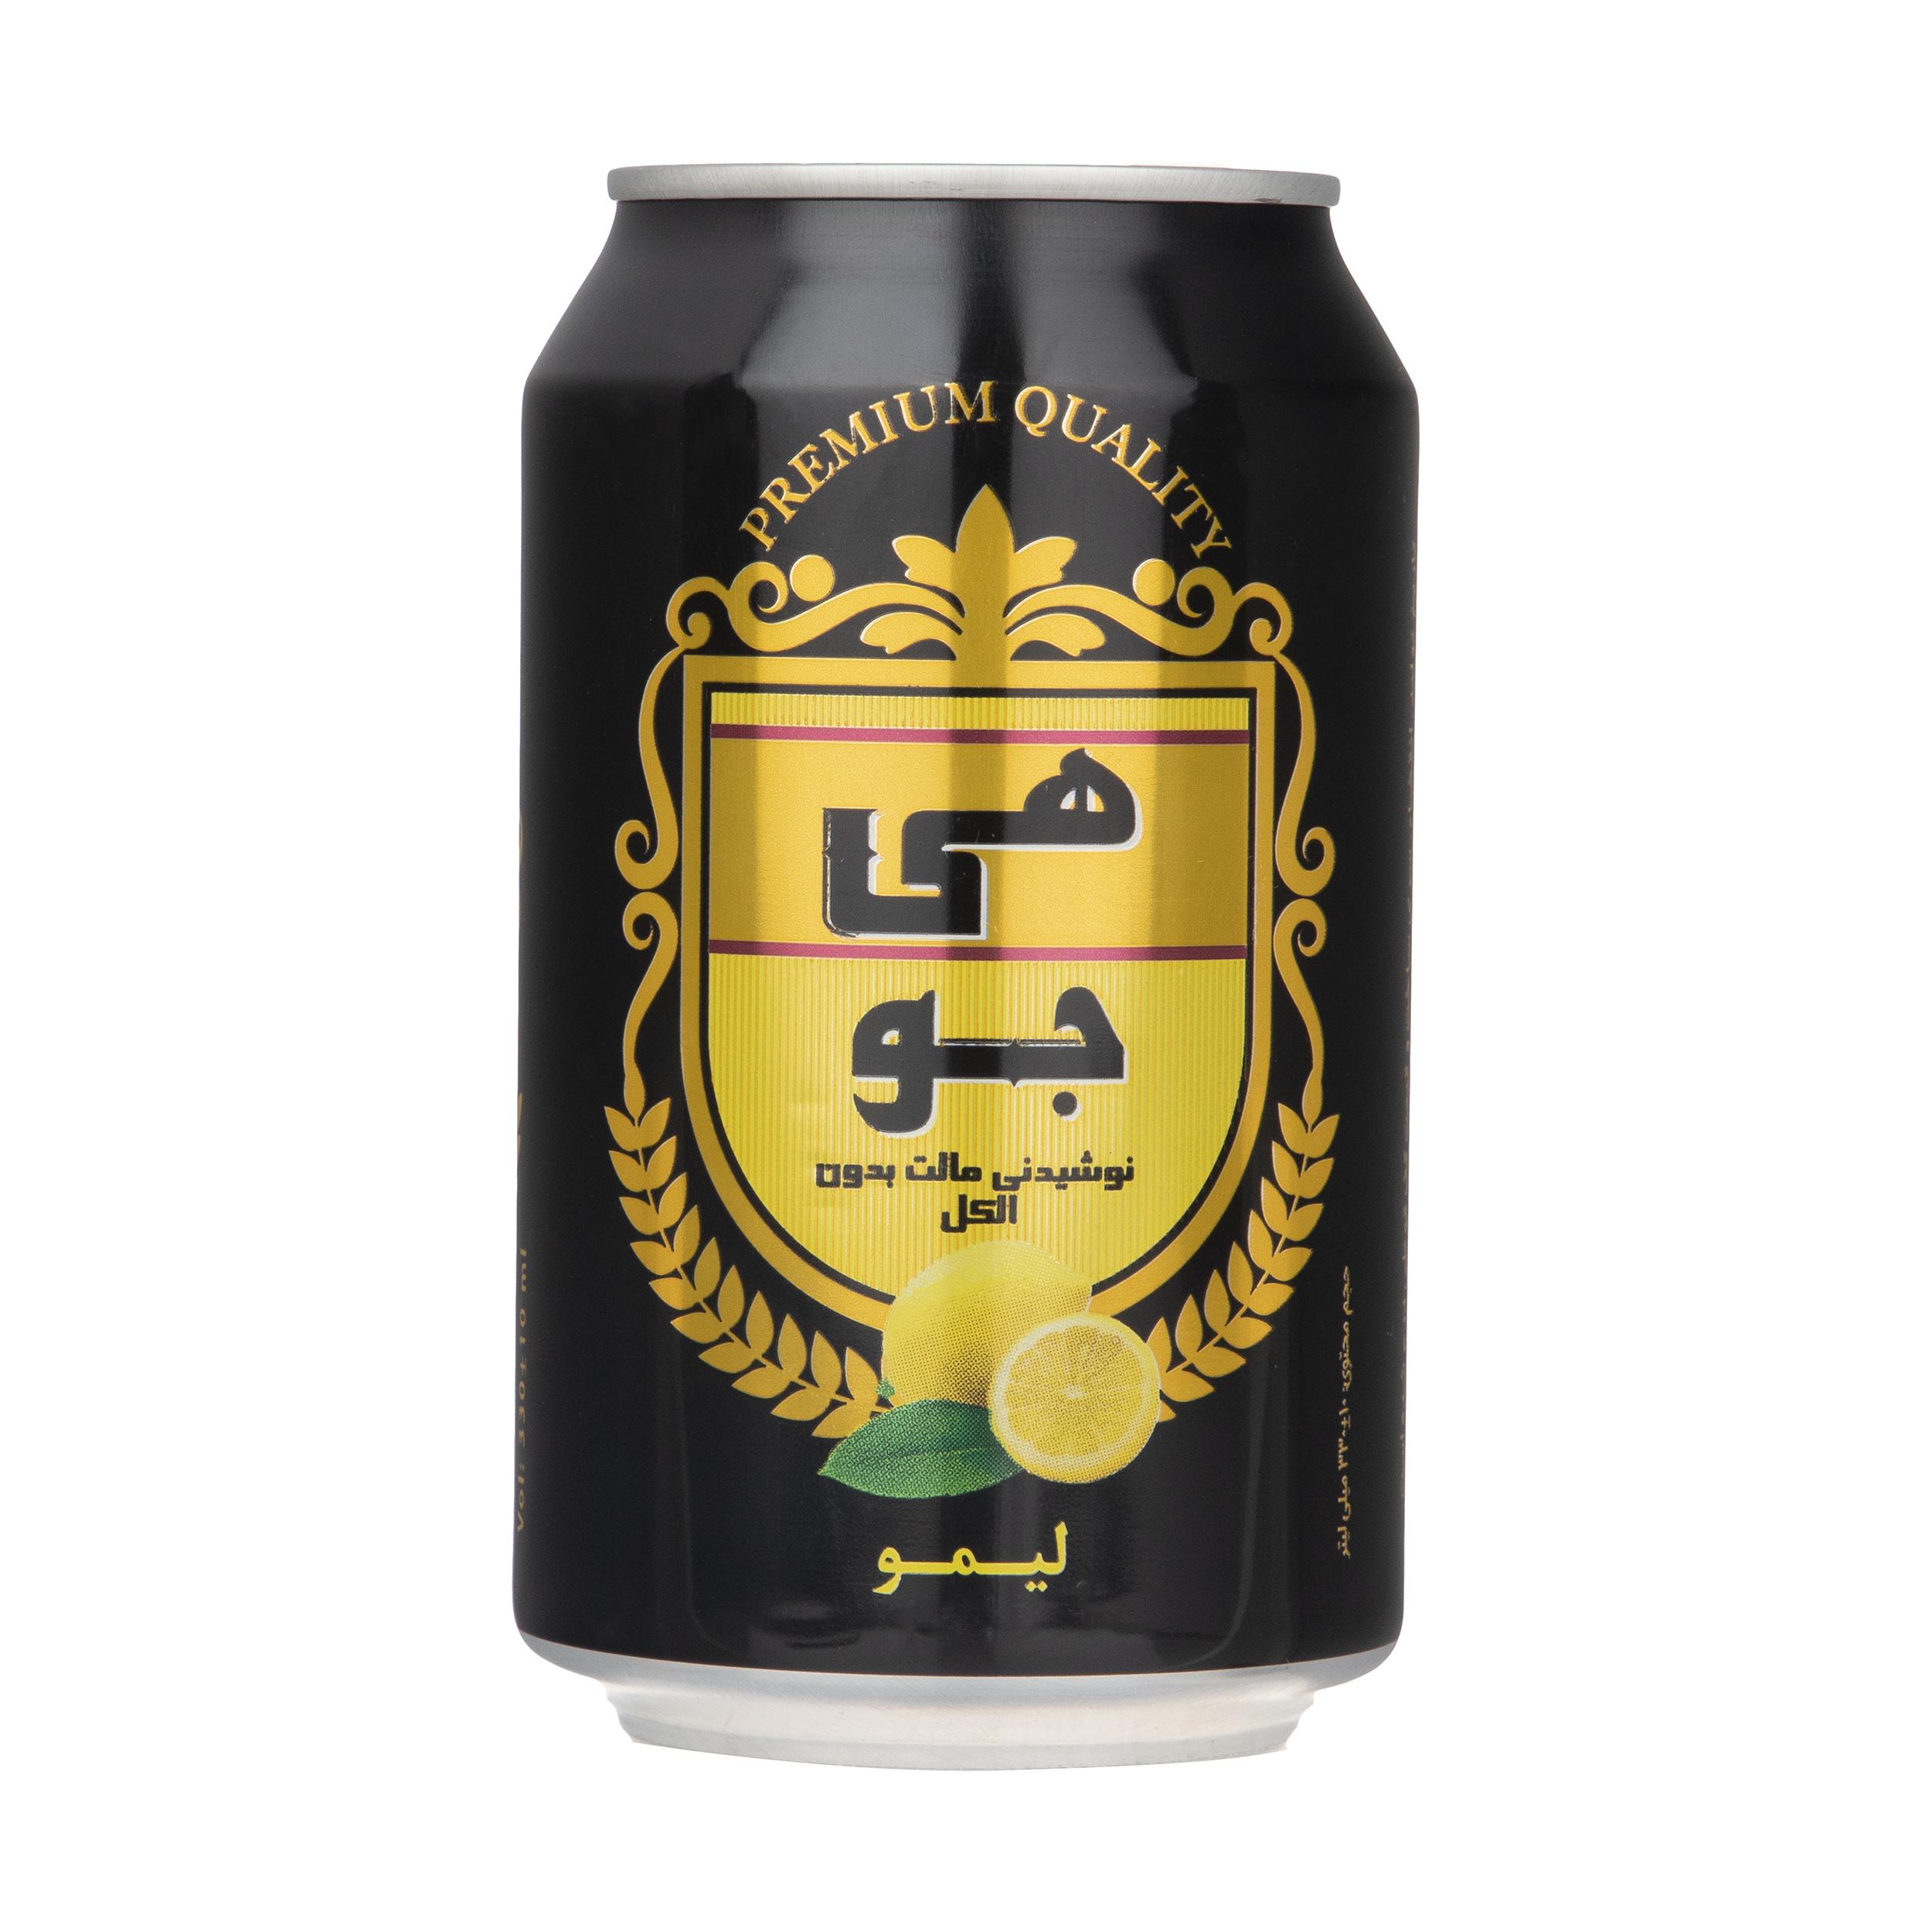 نوشیدنی مالت هی جو با طعم لیمو - 330 میلی لیتر